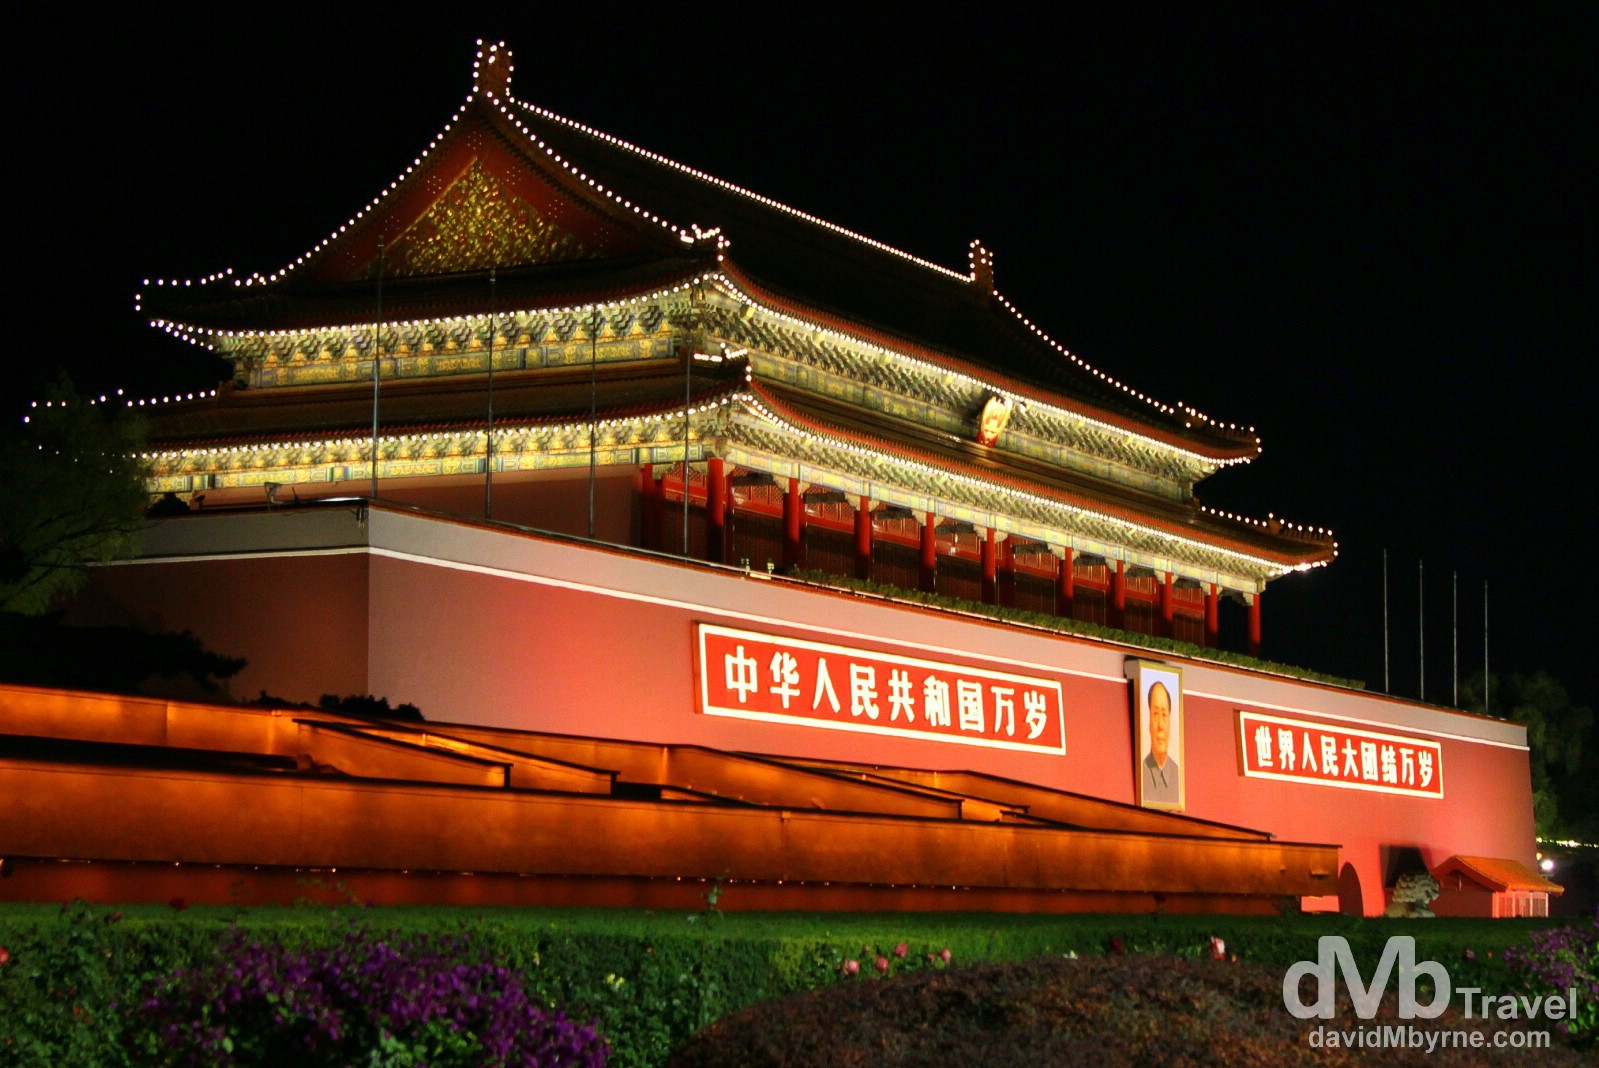 Tian'anmen Gate, Beijing, China. October 27th 2012.